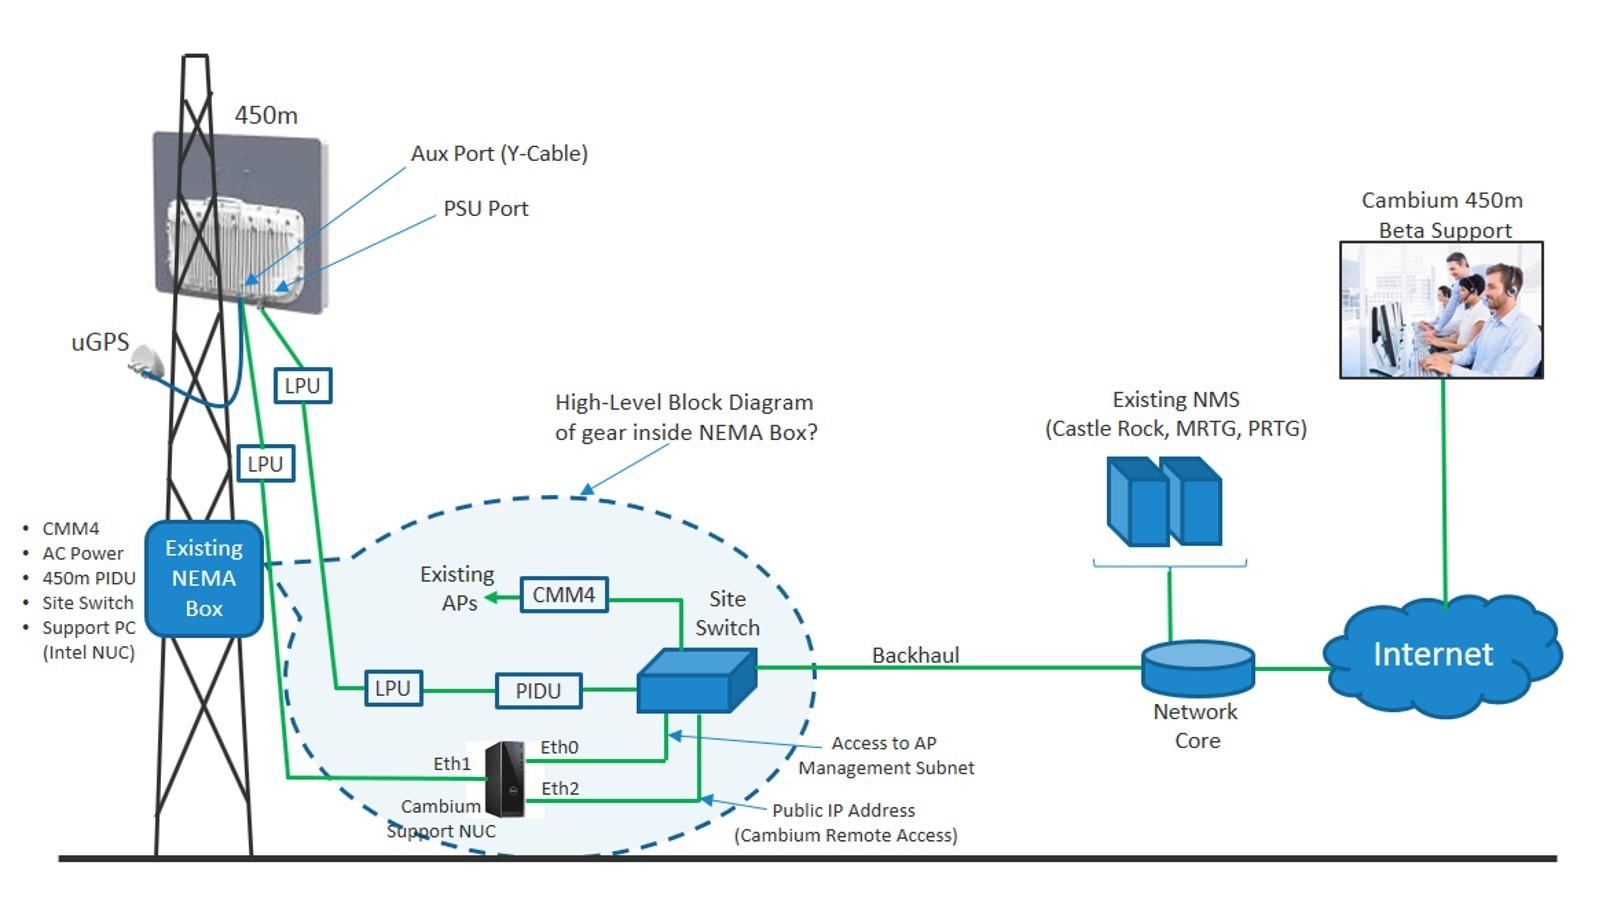 hight resolution of wisp wireless broadband applications